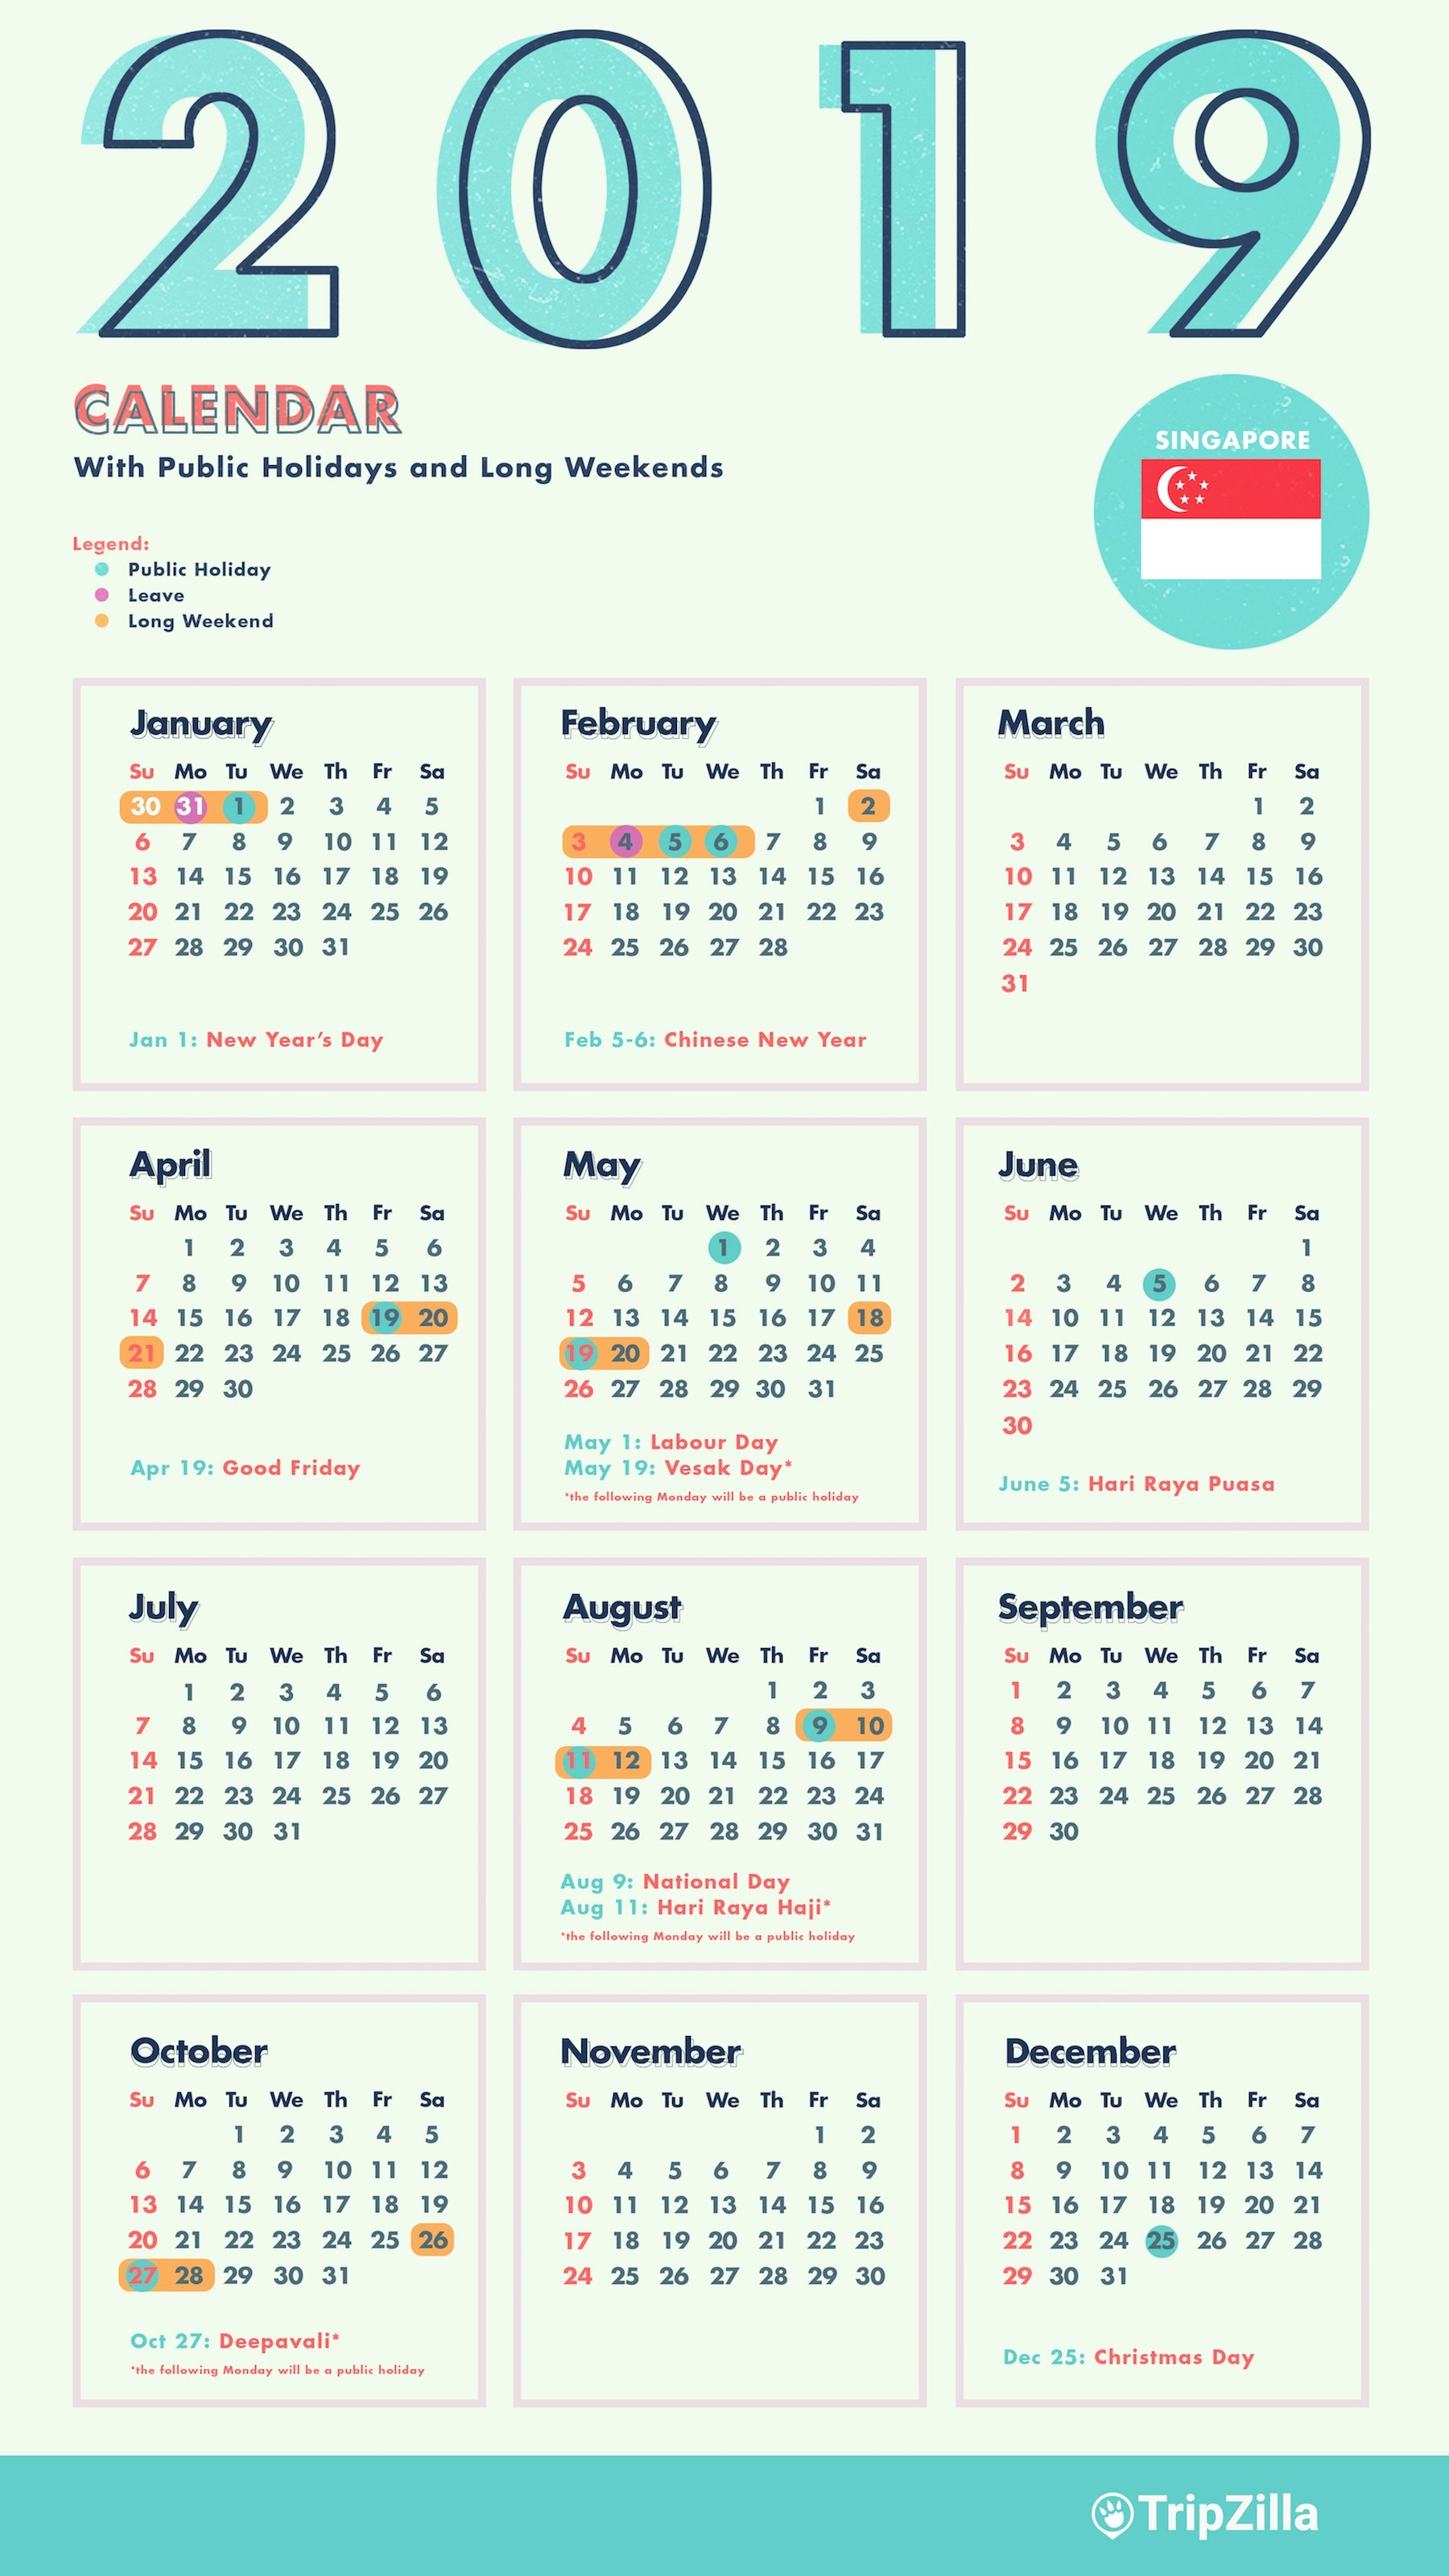 6 Long Weekends In Singapore In 2019 (Bonus Calendar & Cheatsheet) Calendar 2019 National Holidays